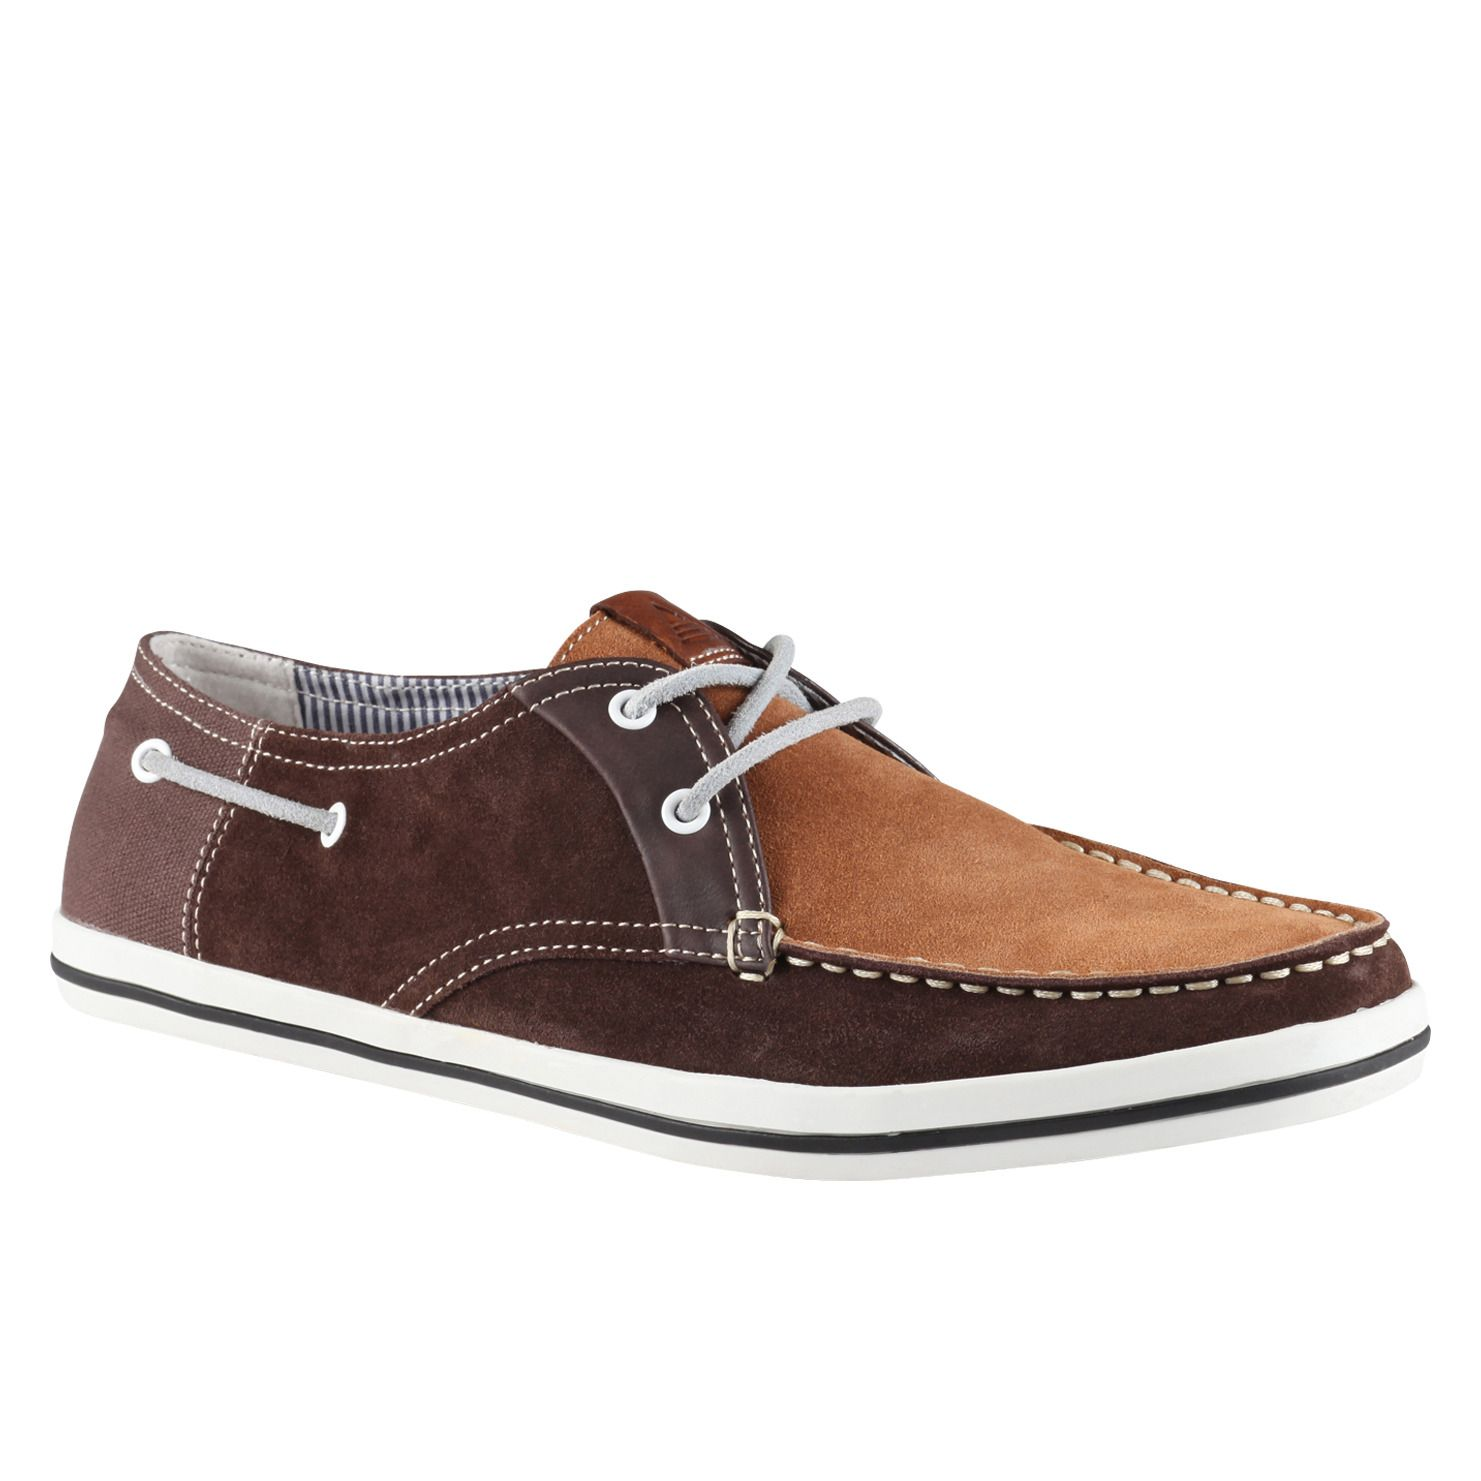 RAPALO - mens casual lace-ups shoes for sale at ALDO Shoes.